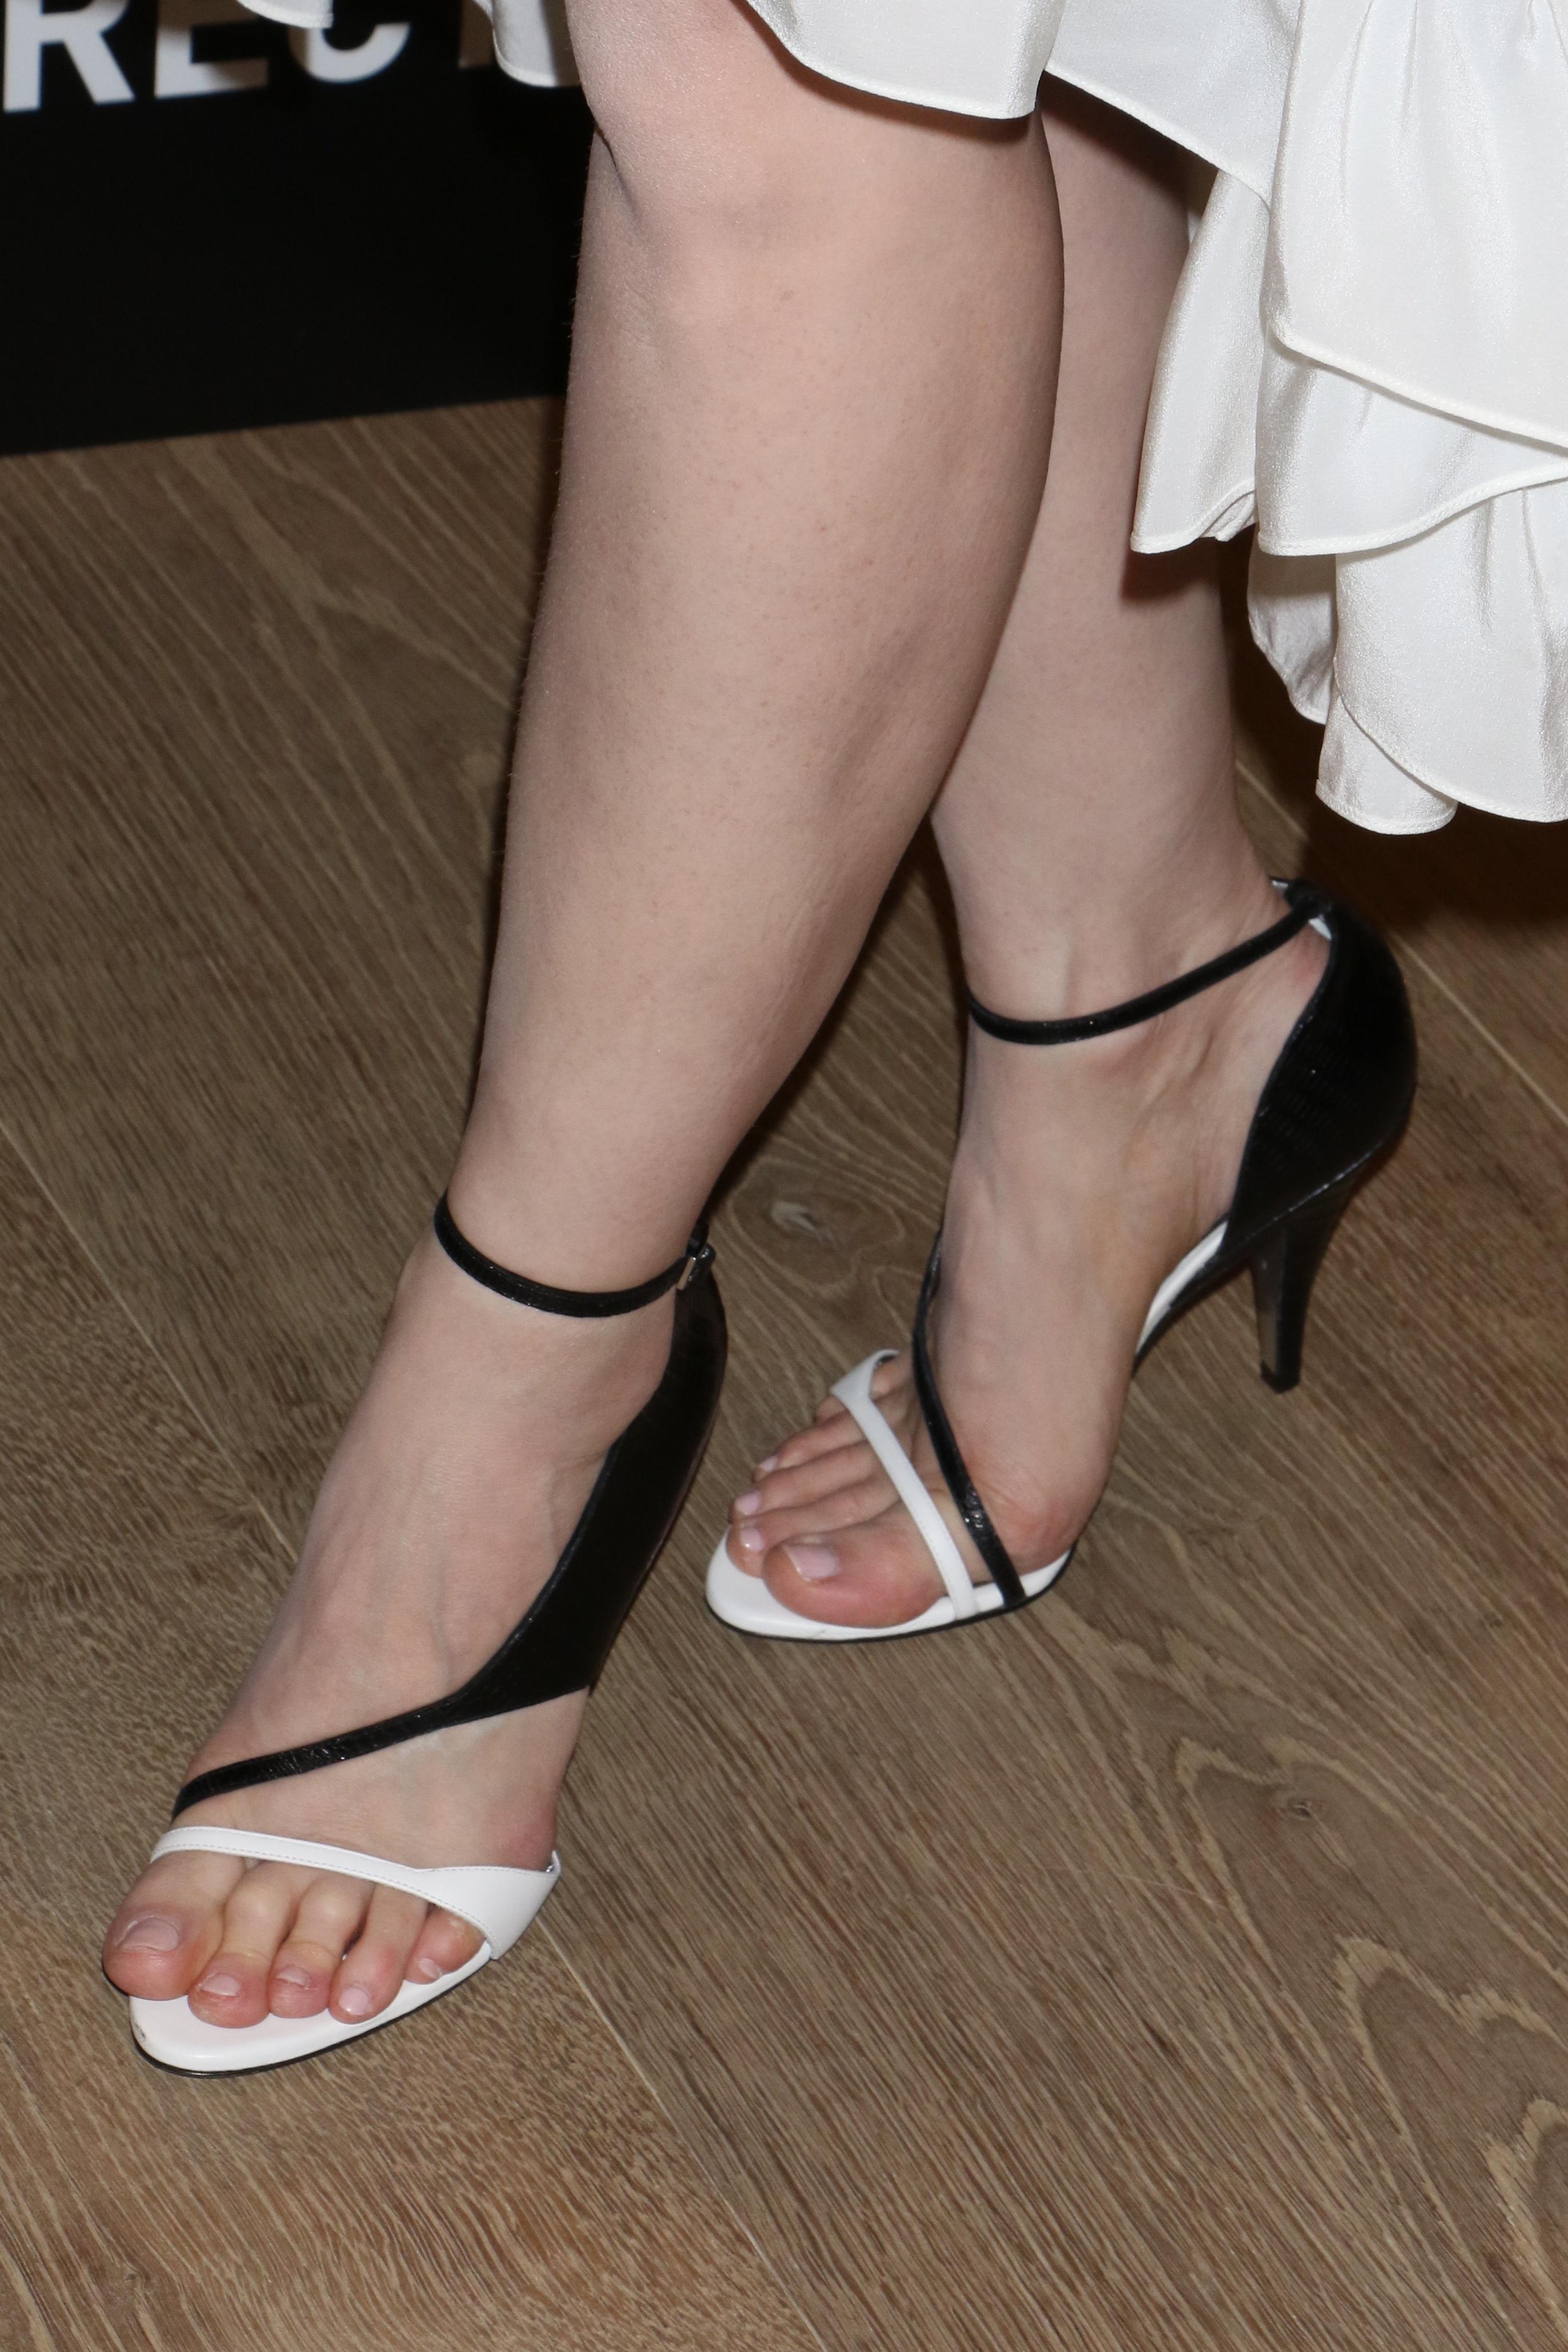 jessica chastain feet